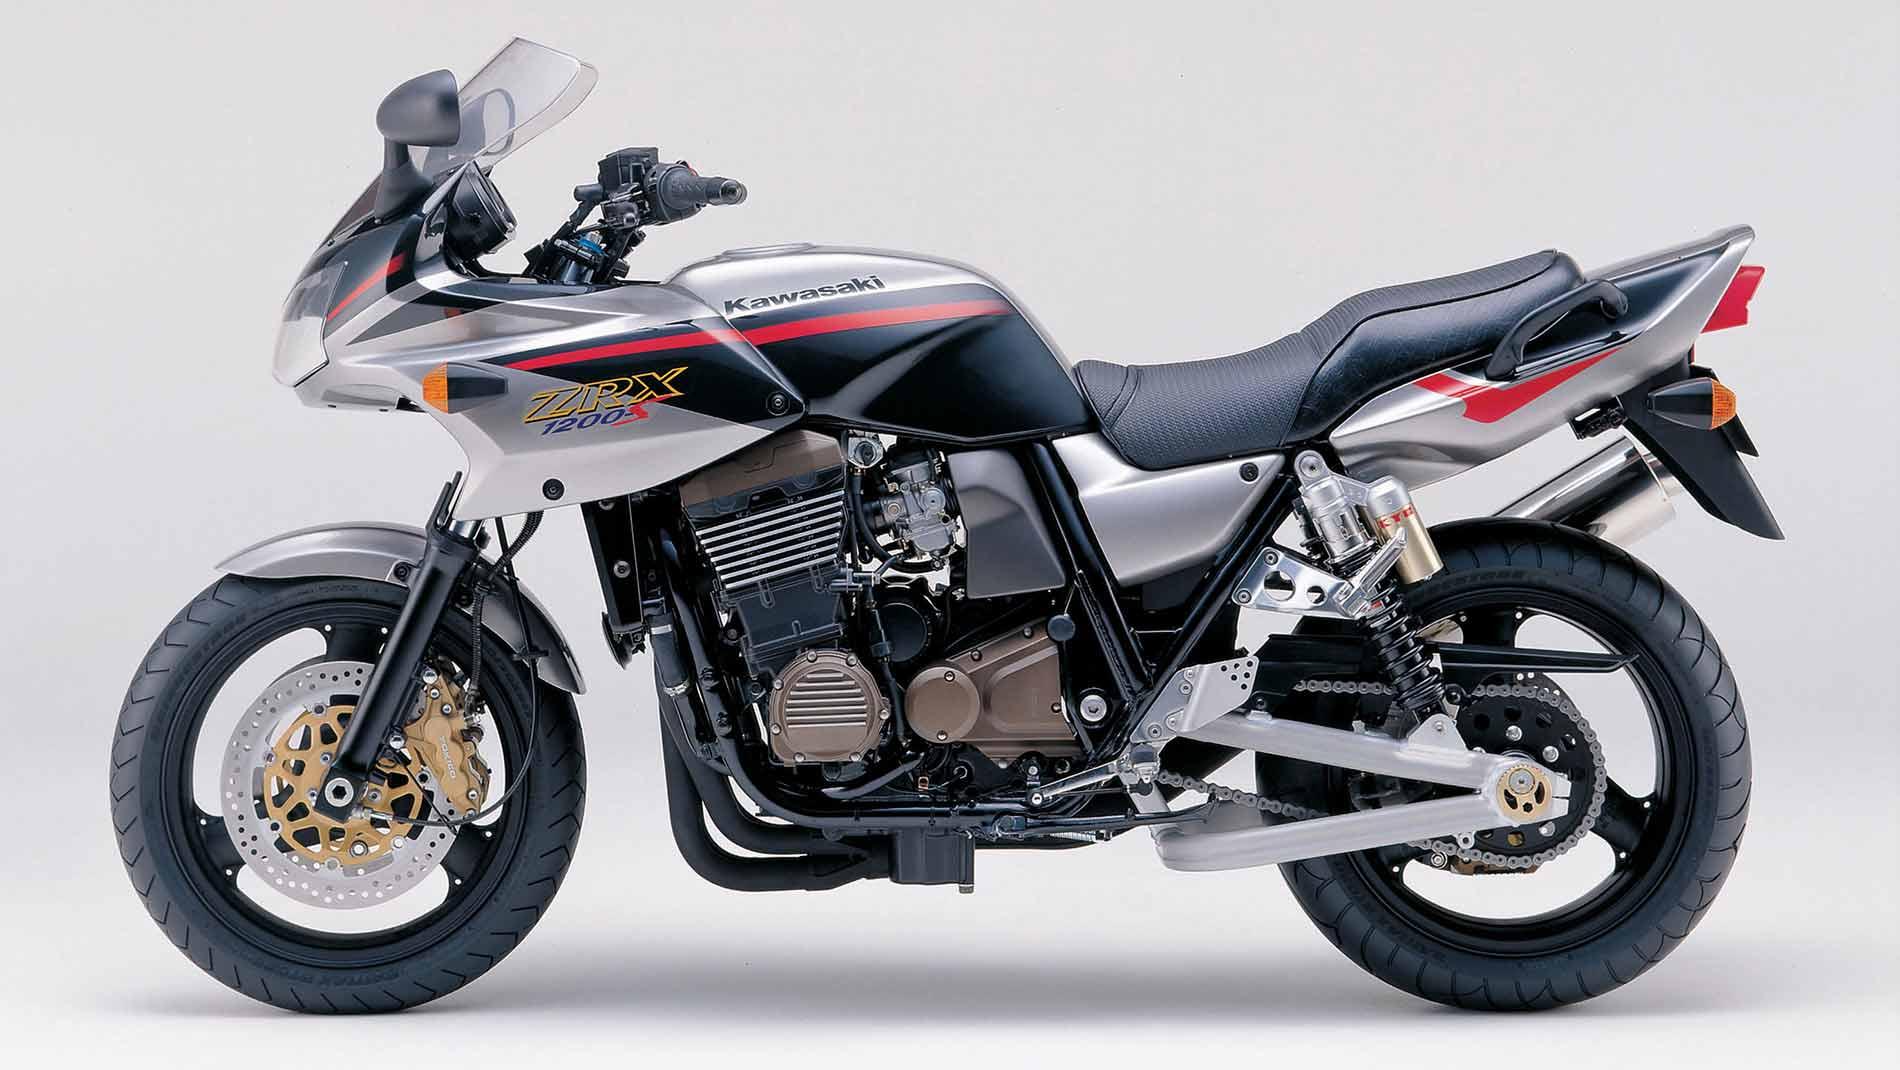 2002-k-zxr-s-zrt20b02